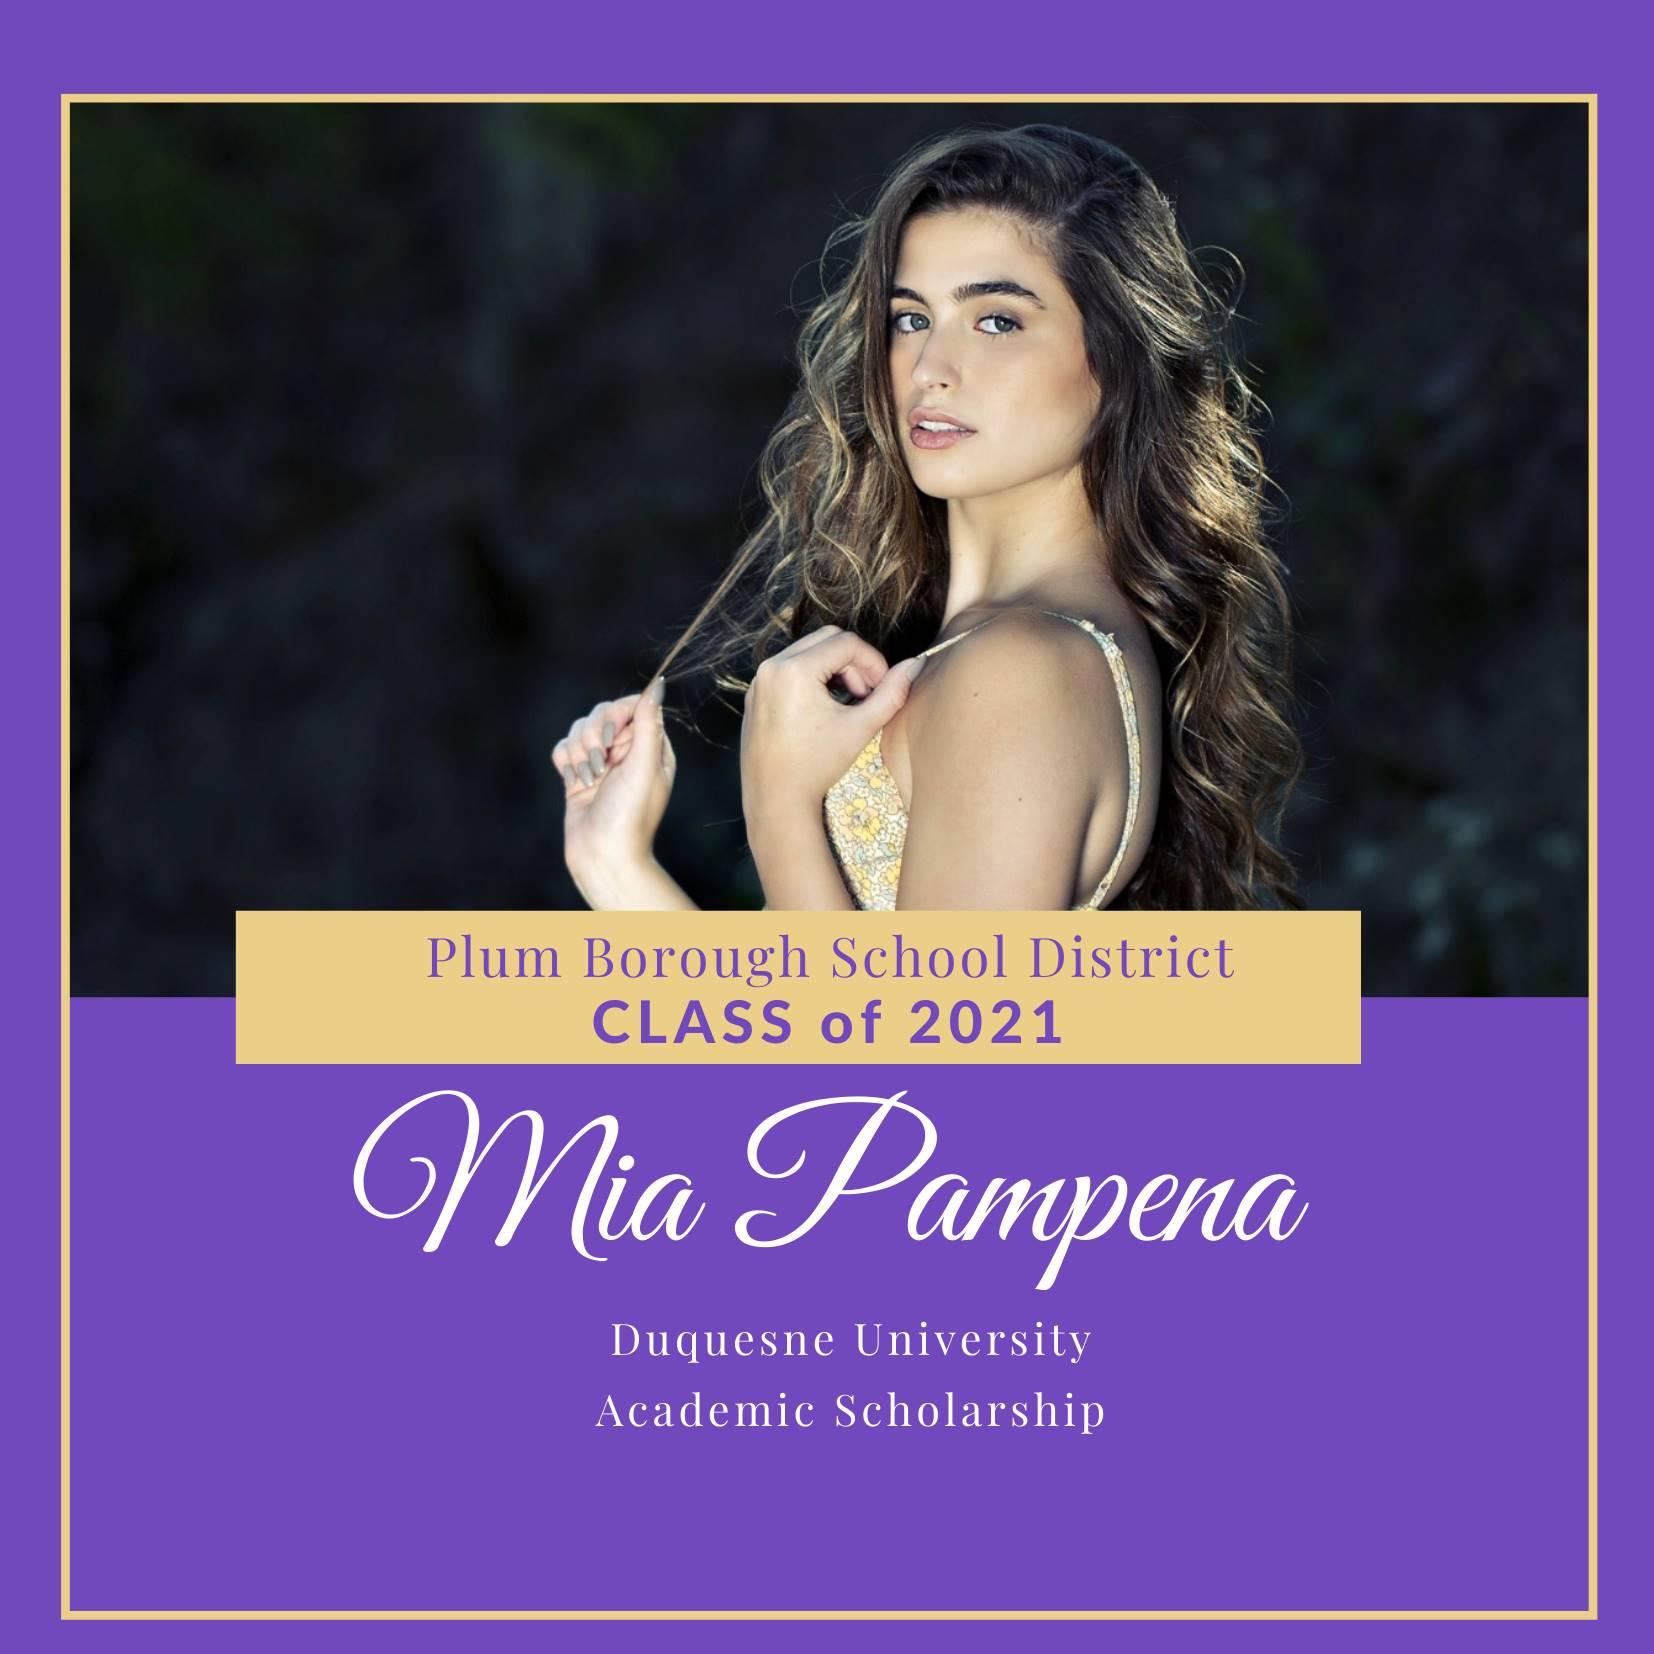 Congratulations to Mia Pampena, Class of 2021!